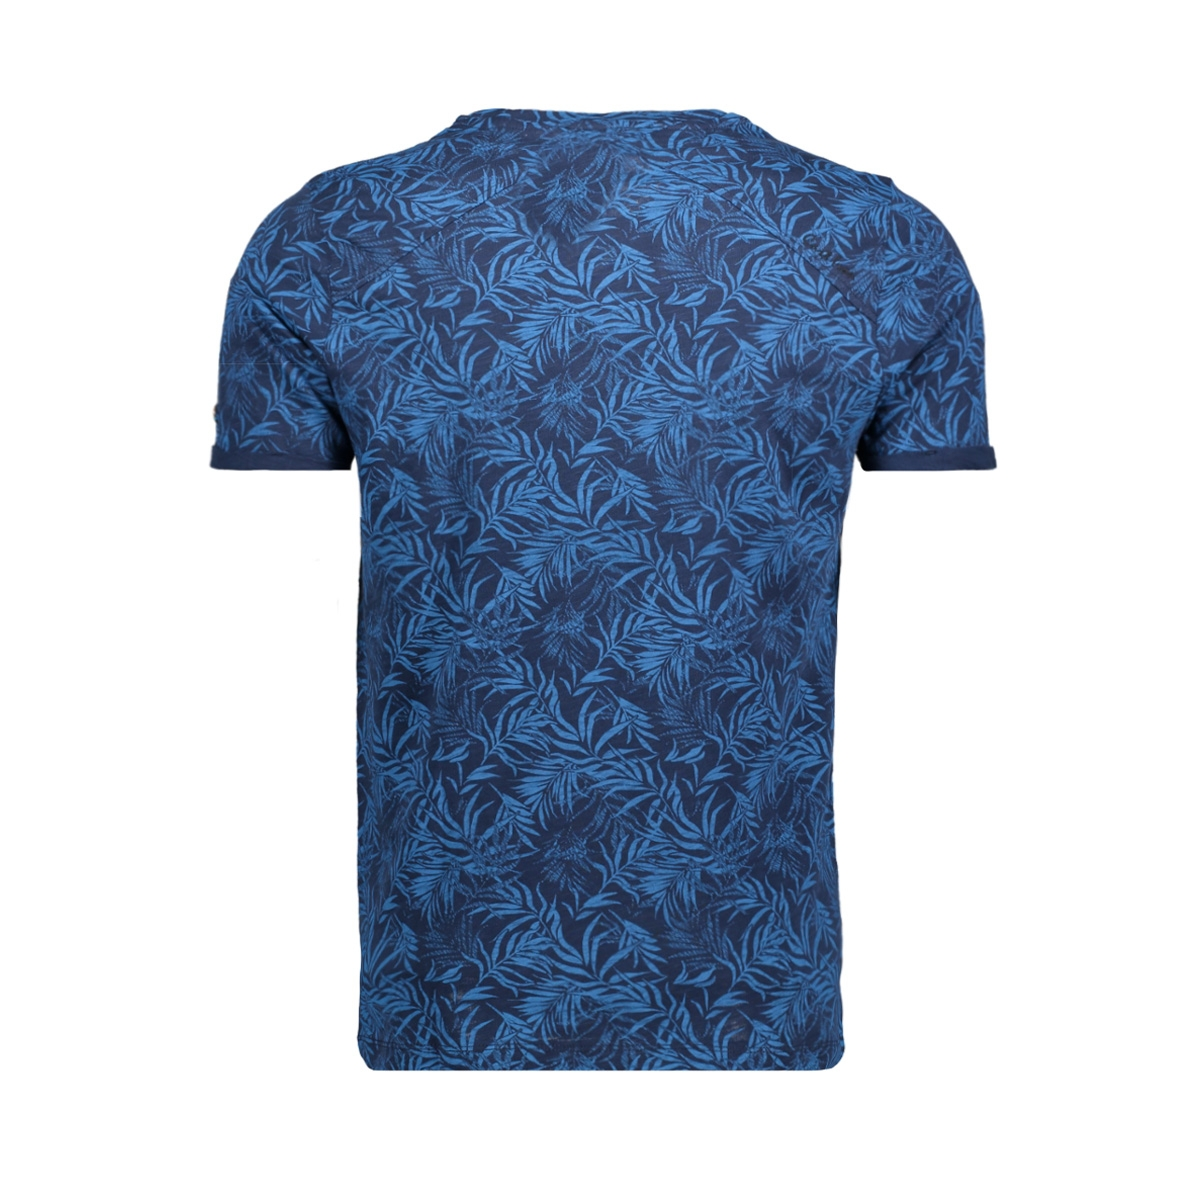 ctss178321 cast iron t-shirt 5241